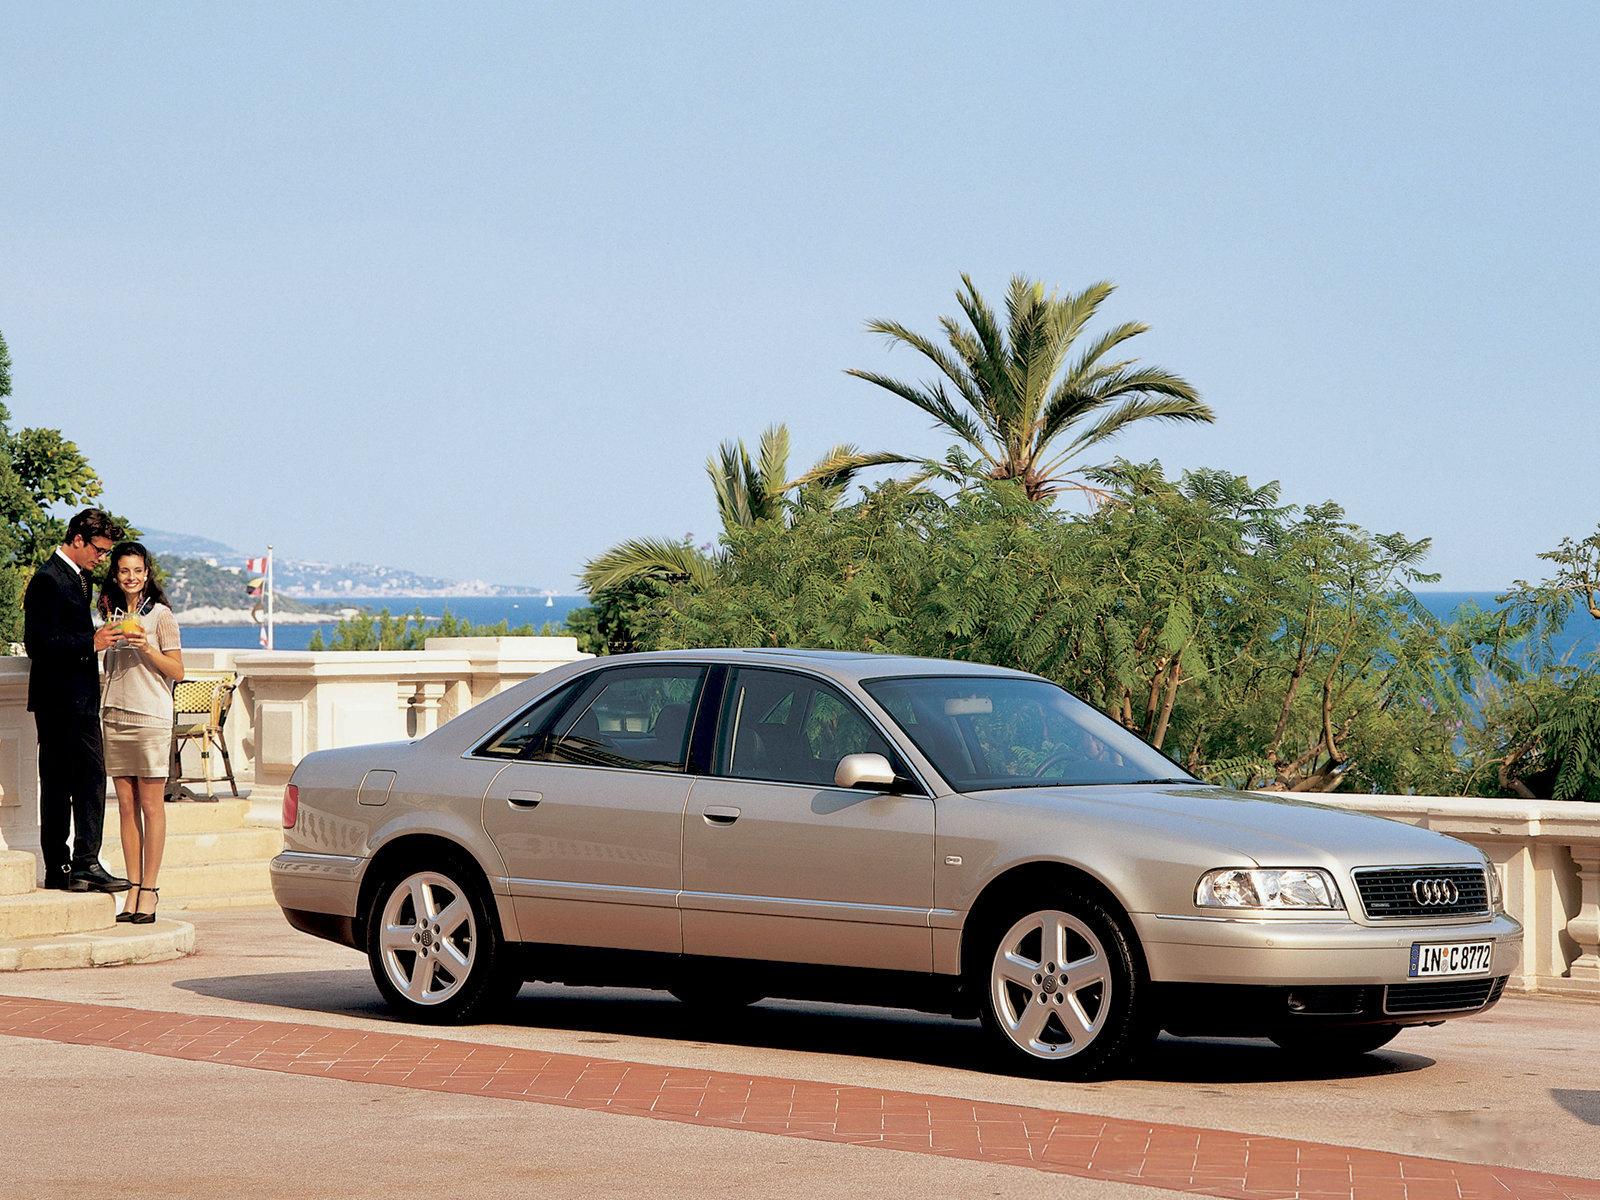 Audi A8 I (D2) 1994 - 1998 Sedan #5